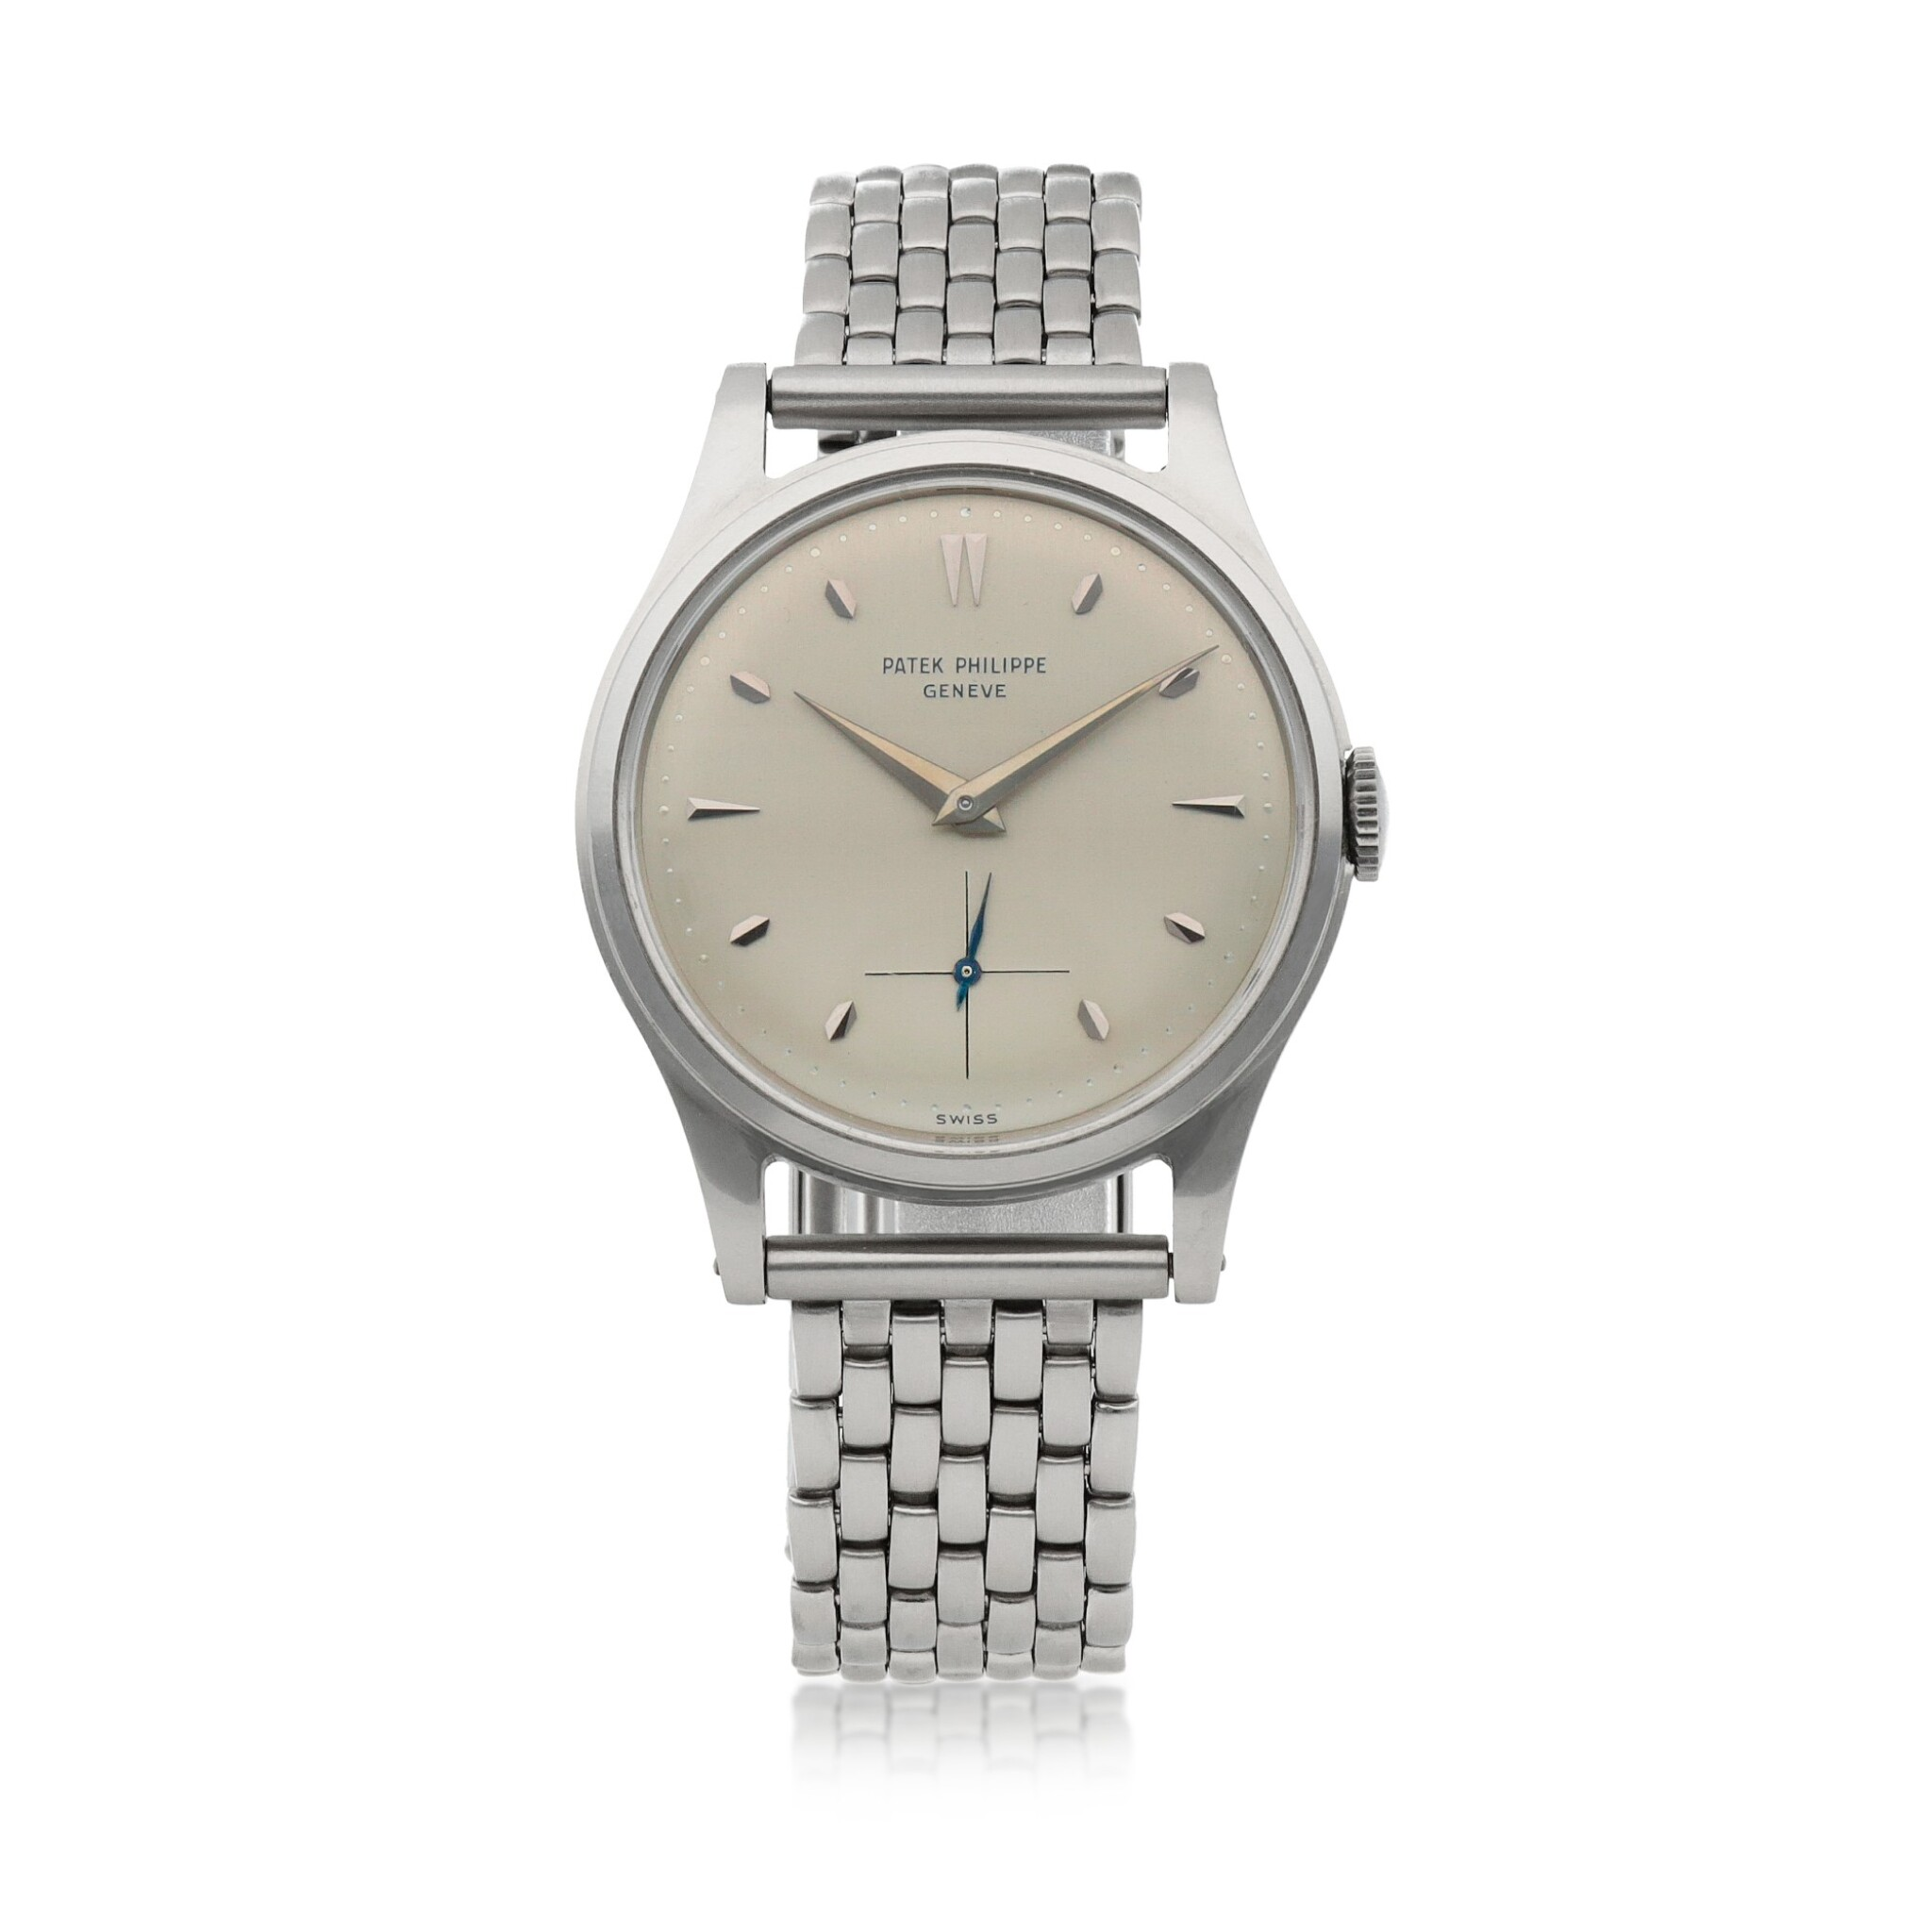 View full screen - View 1 of Lot 71. Ref. 2509 Stainless steel wristwatch with associated bracelet Made in 1954 | 百達翡麗 2509型號精鋼鍊帶腕錶,1954年製.